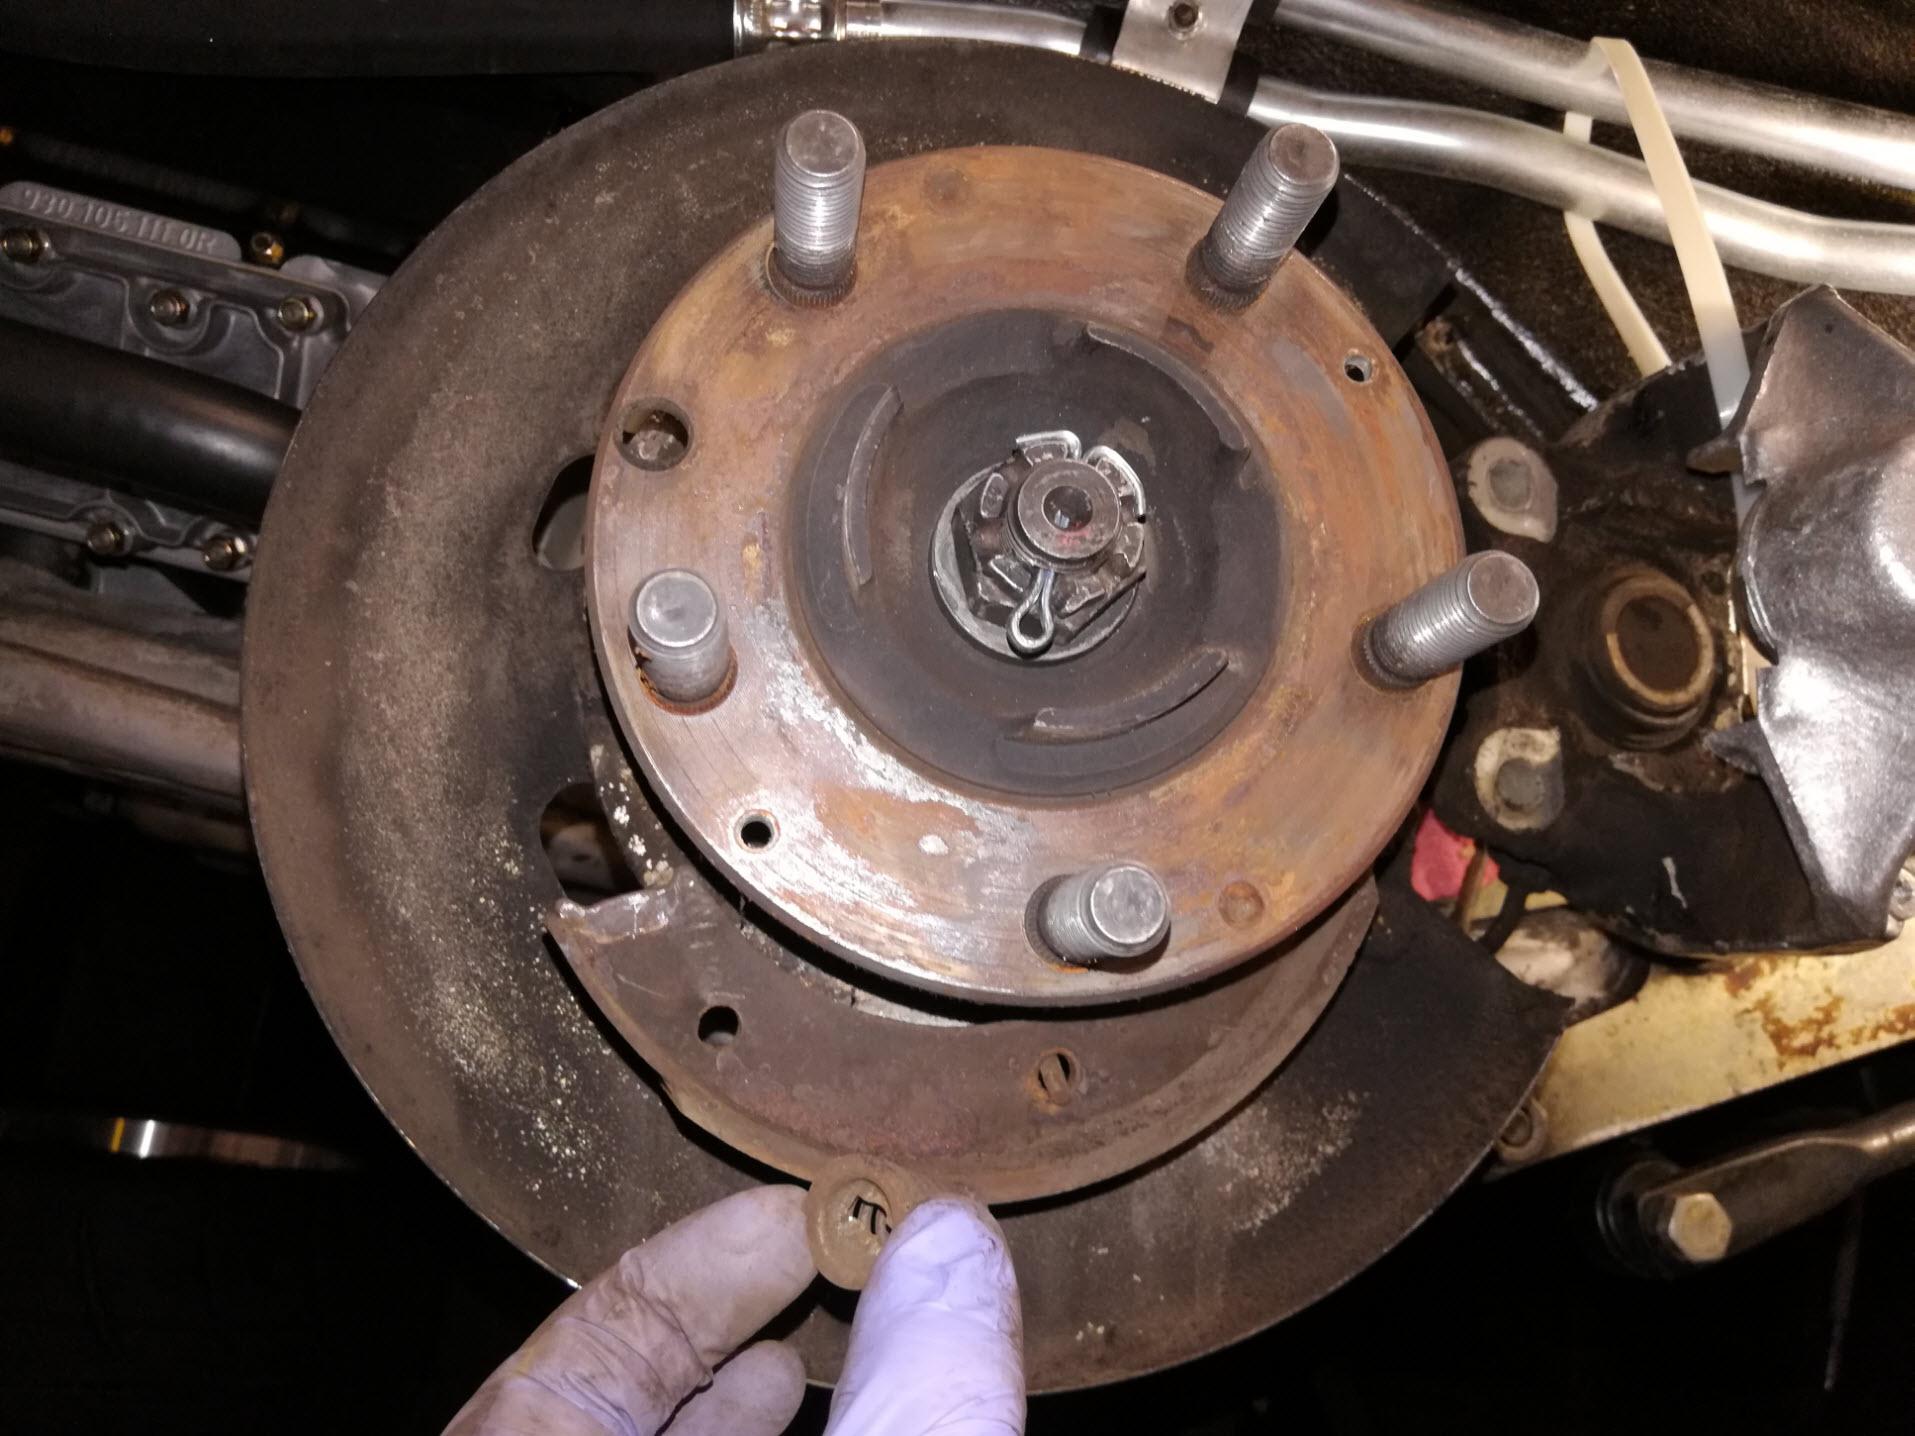 Air-cooled Porsche 911 parking brake spring removal.